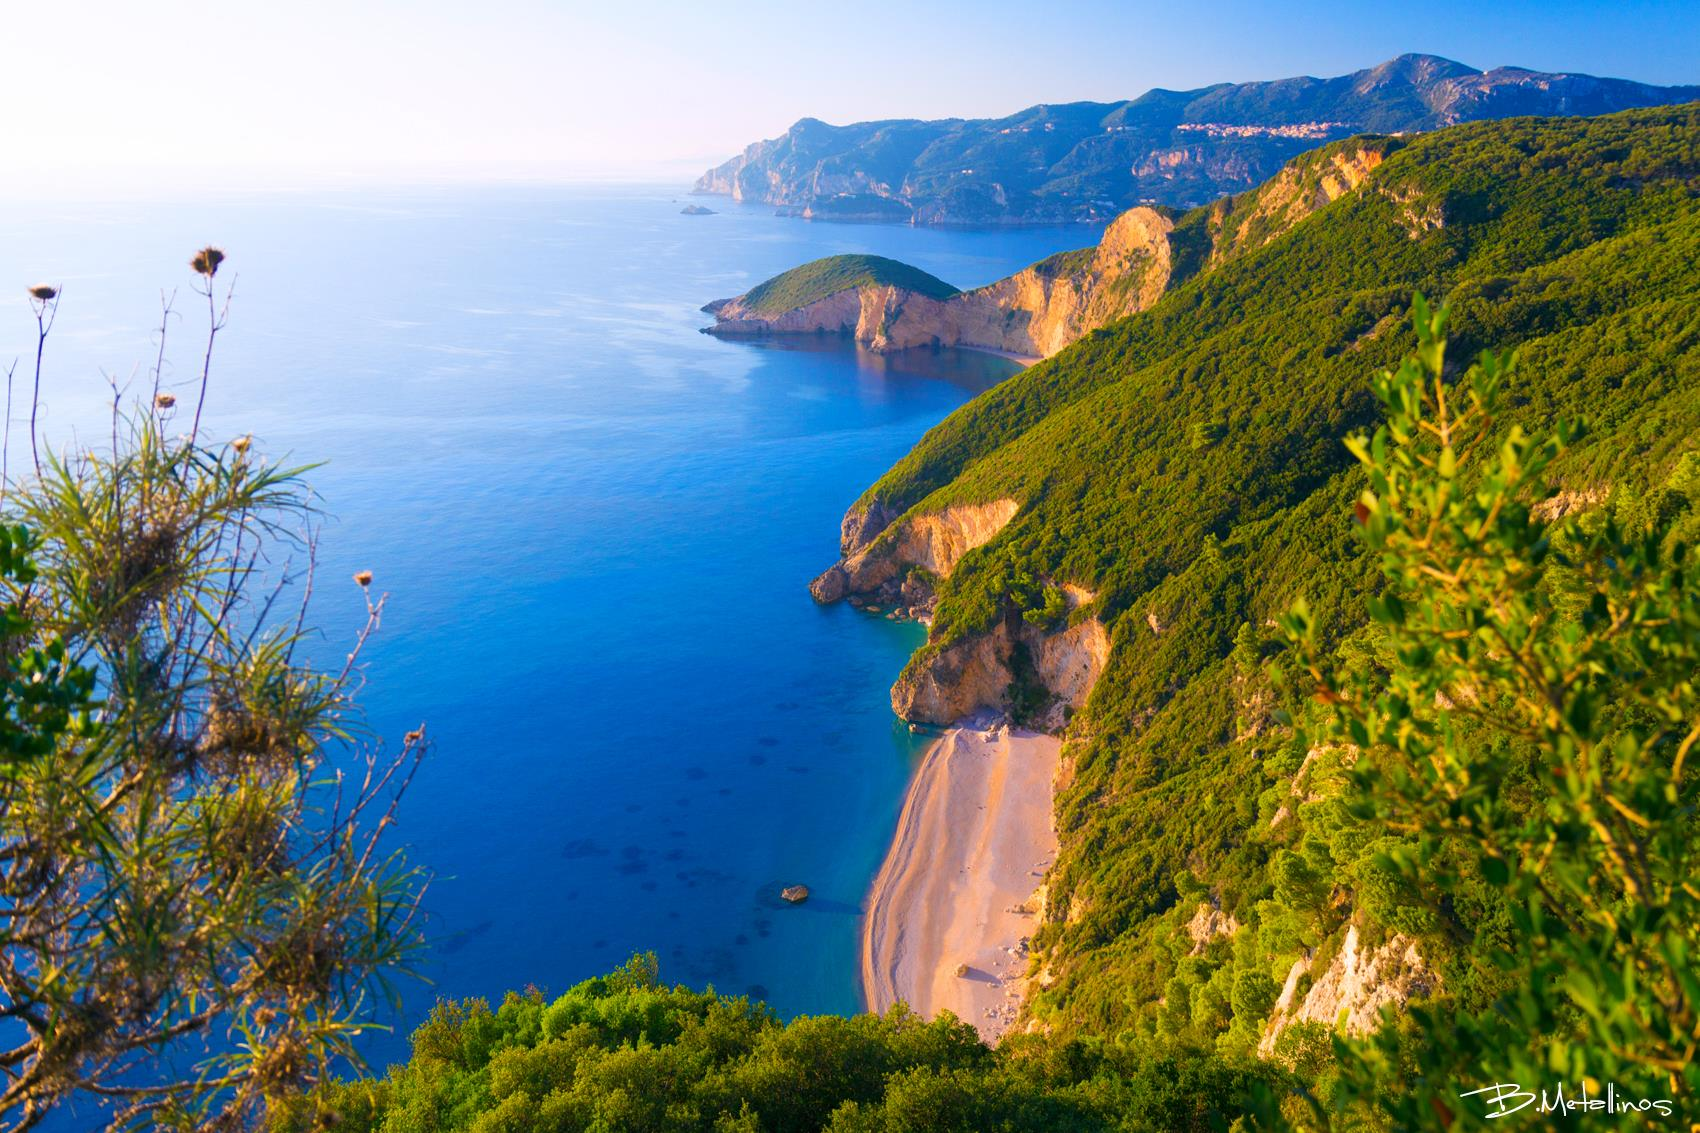 stelari beach and chomoi beach paleokastritsa liapades